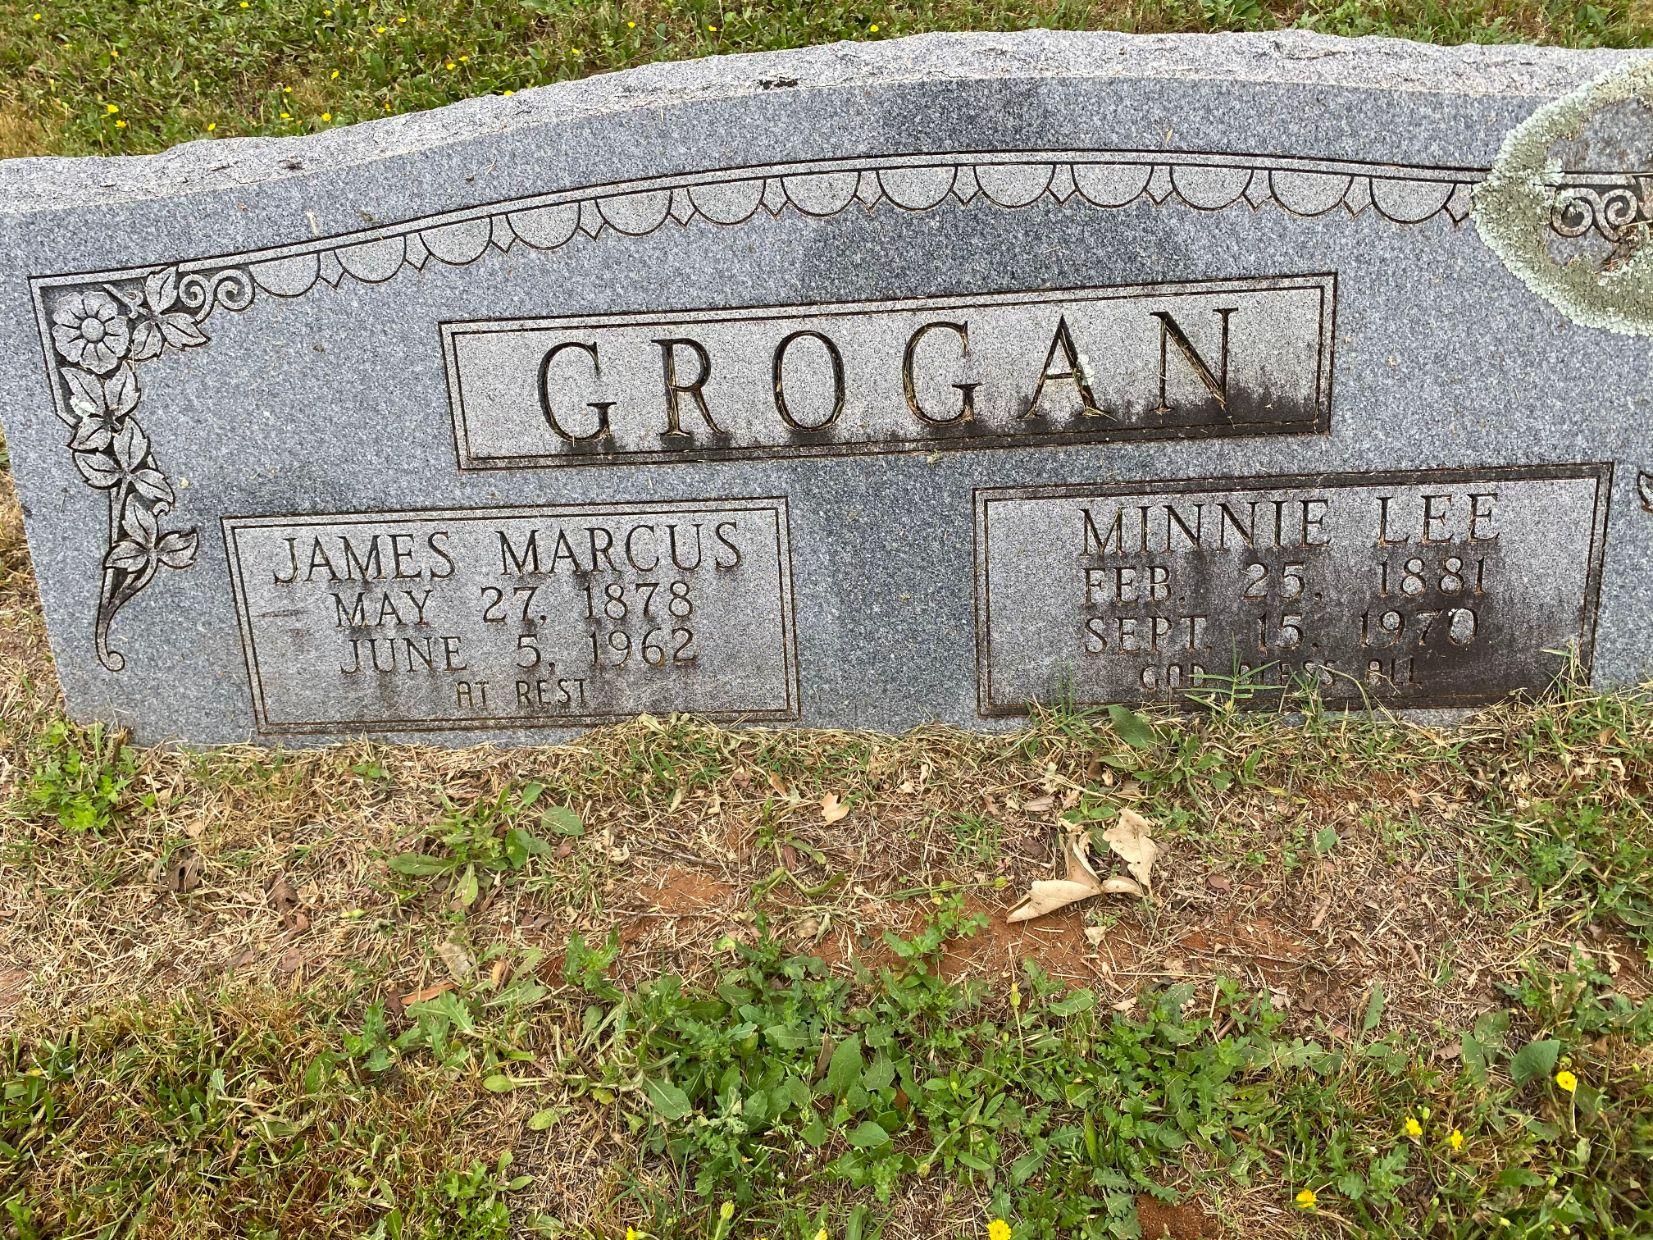 Grogan